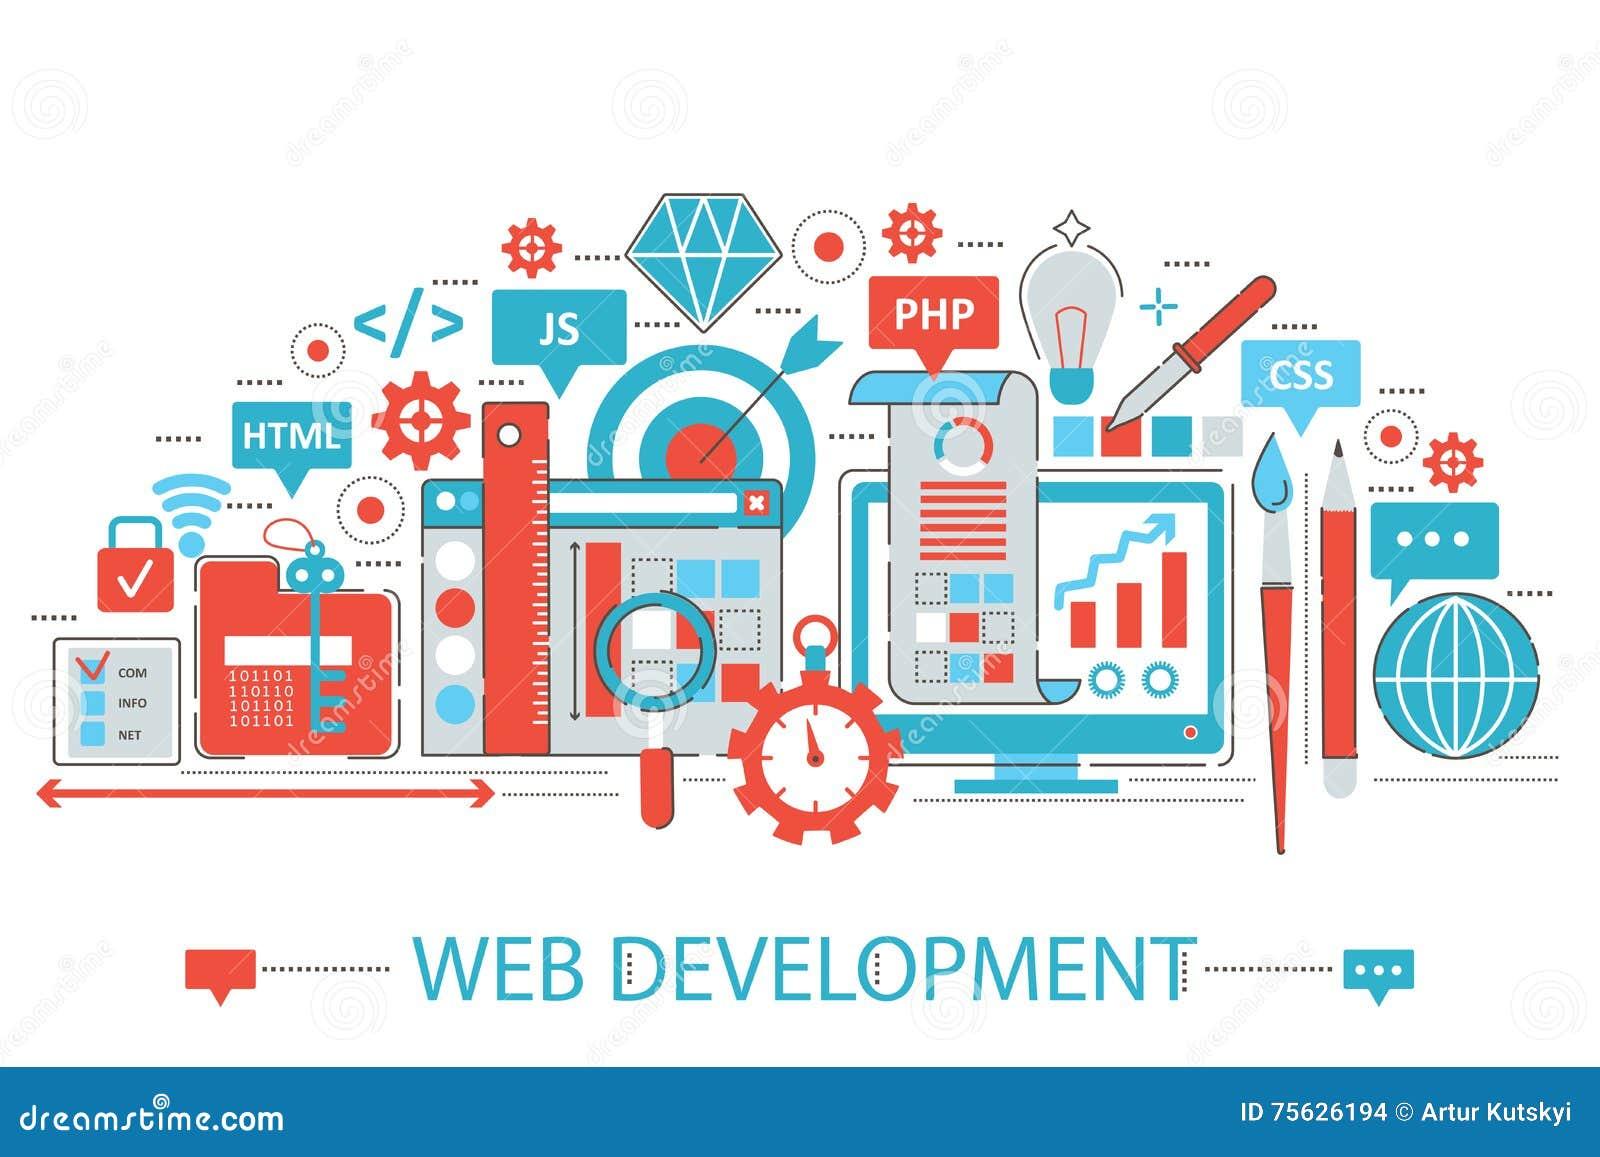 Responsive Web Design Development Process